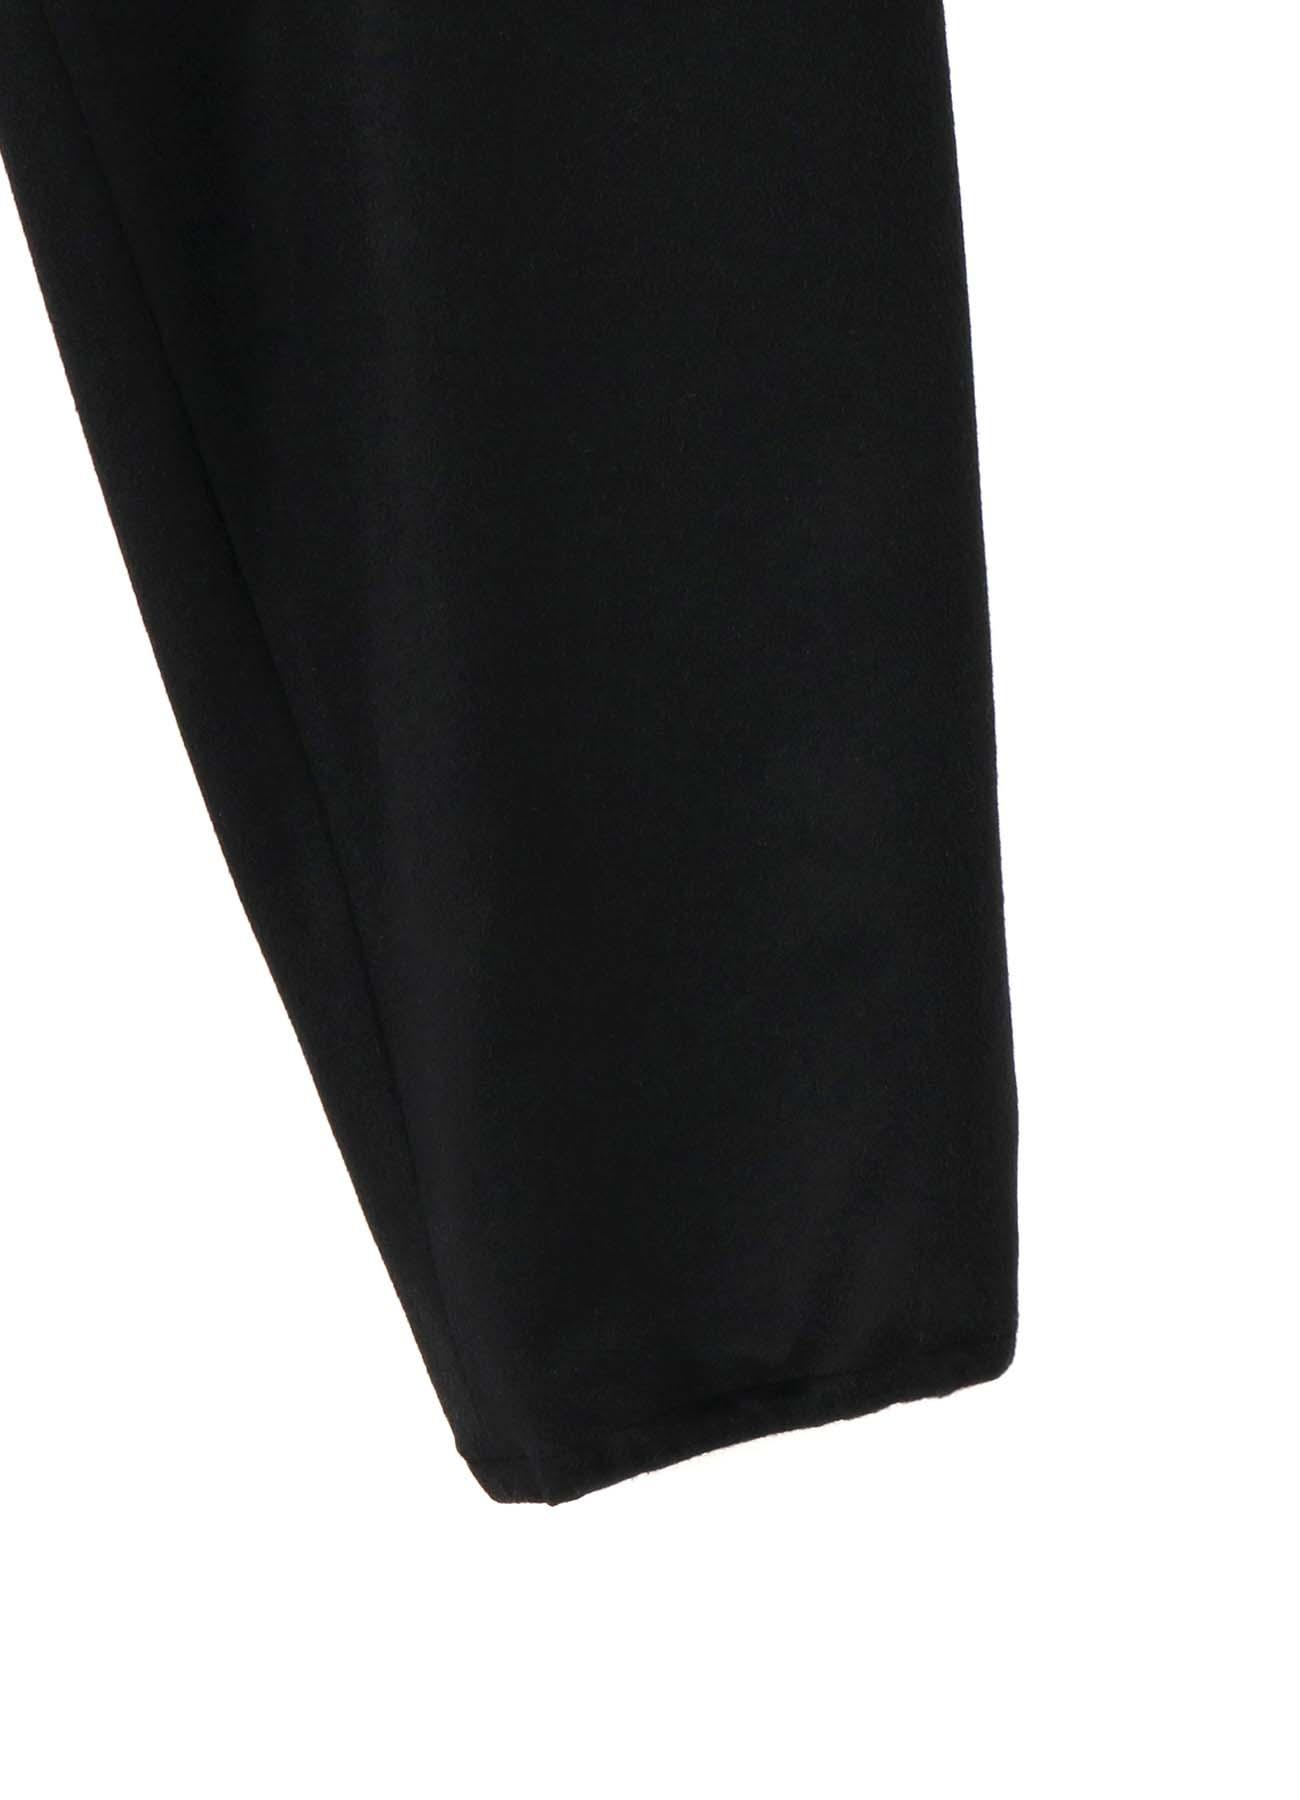 W/CA BEAVER RIB FLAP POCKET PANTS